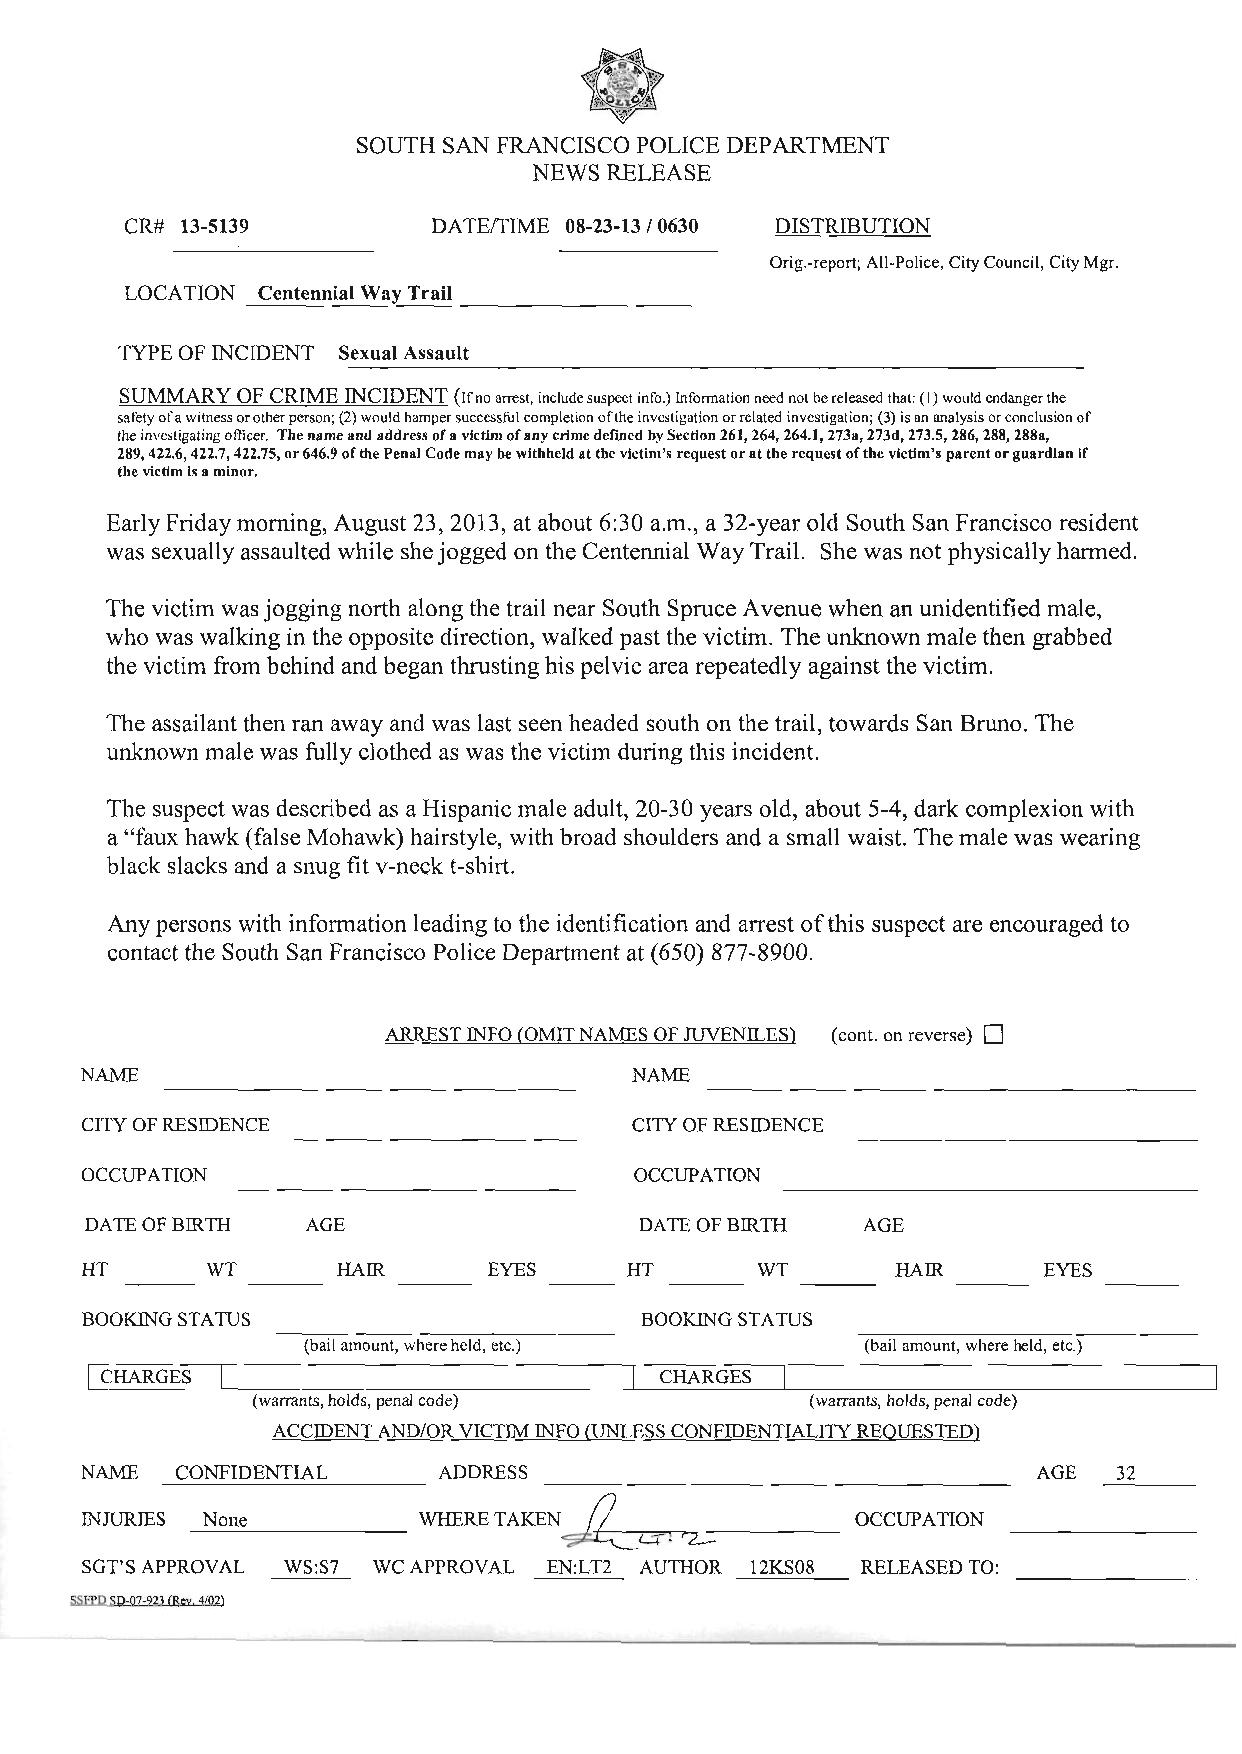 SSFPD8.23.2013 Sexual Assault-page-001